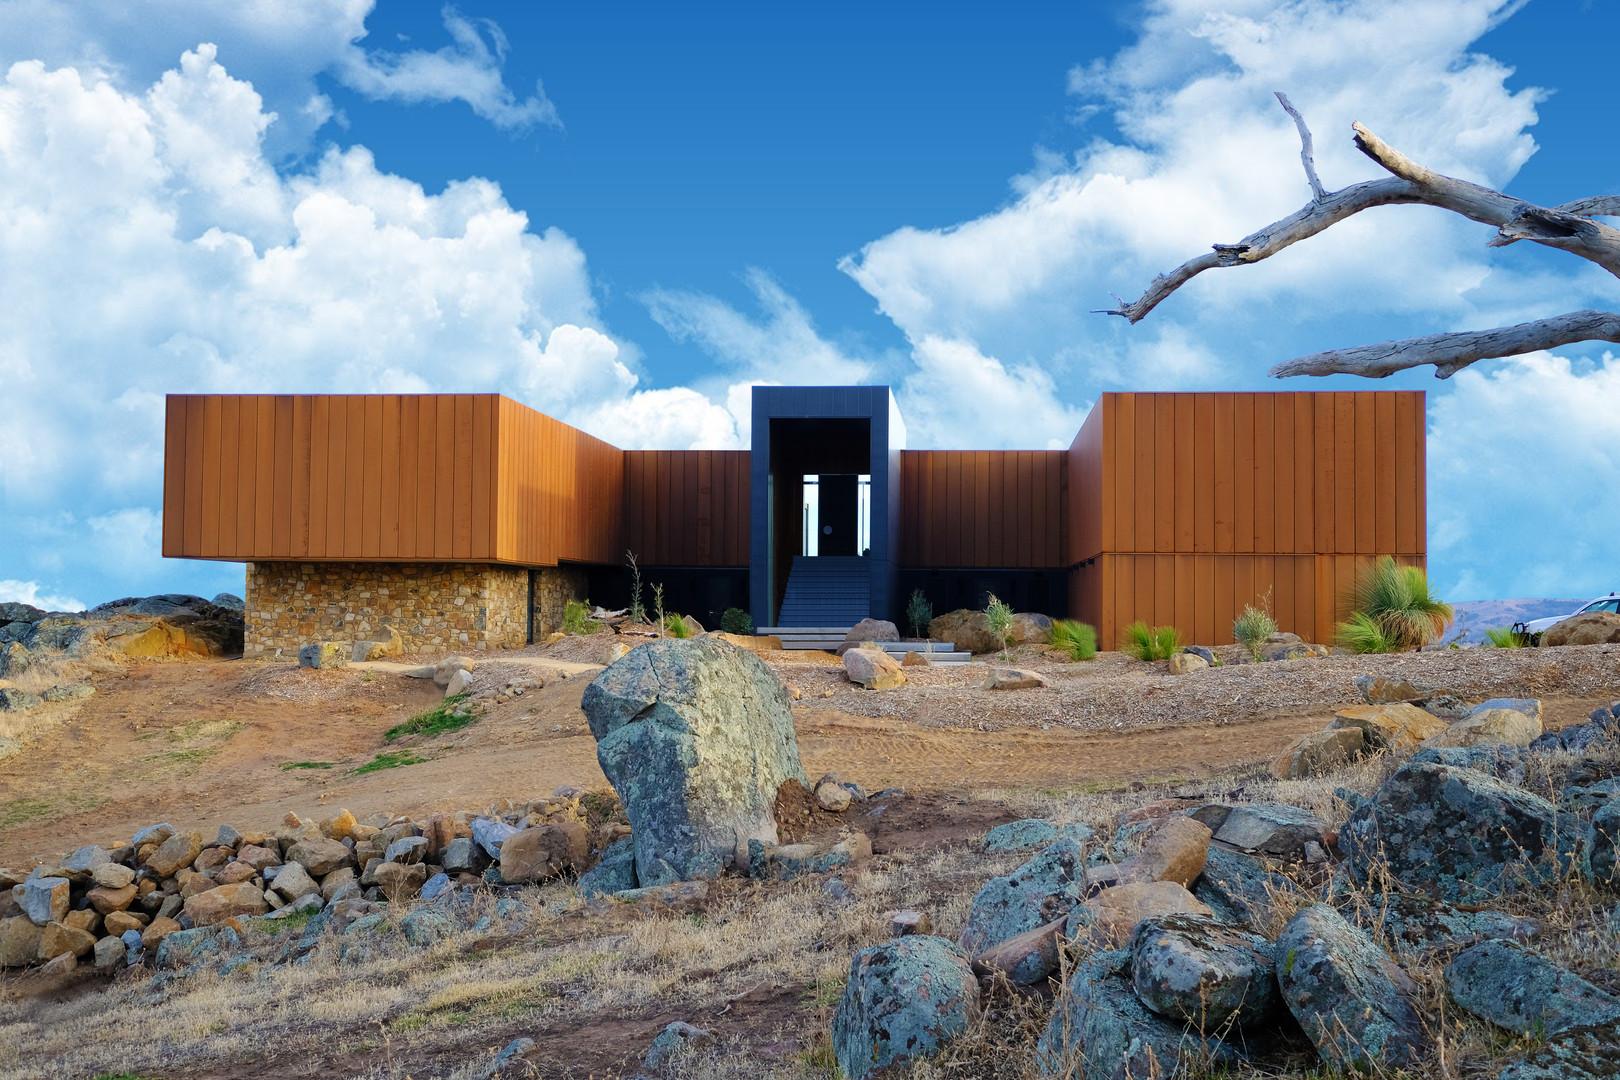 EUROA HOUSE as featured on Grand Designs Australia Season 8 (2019)